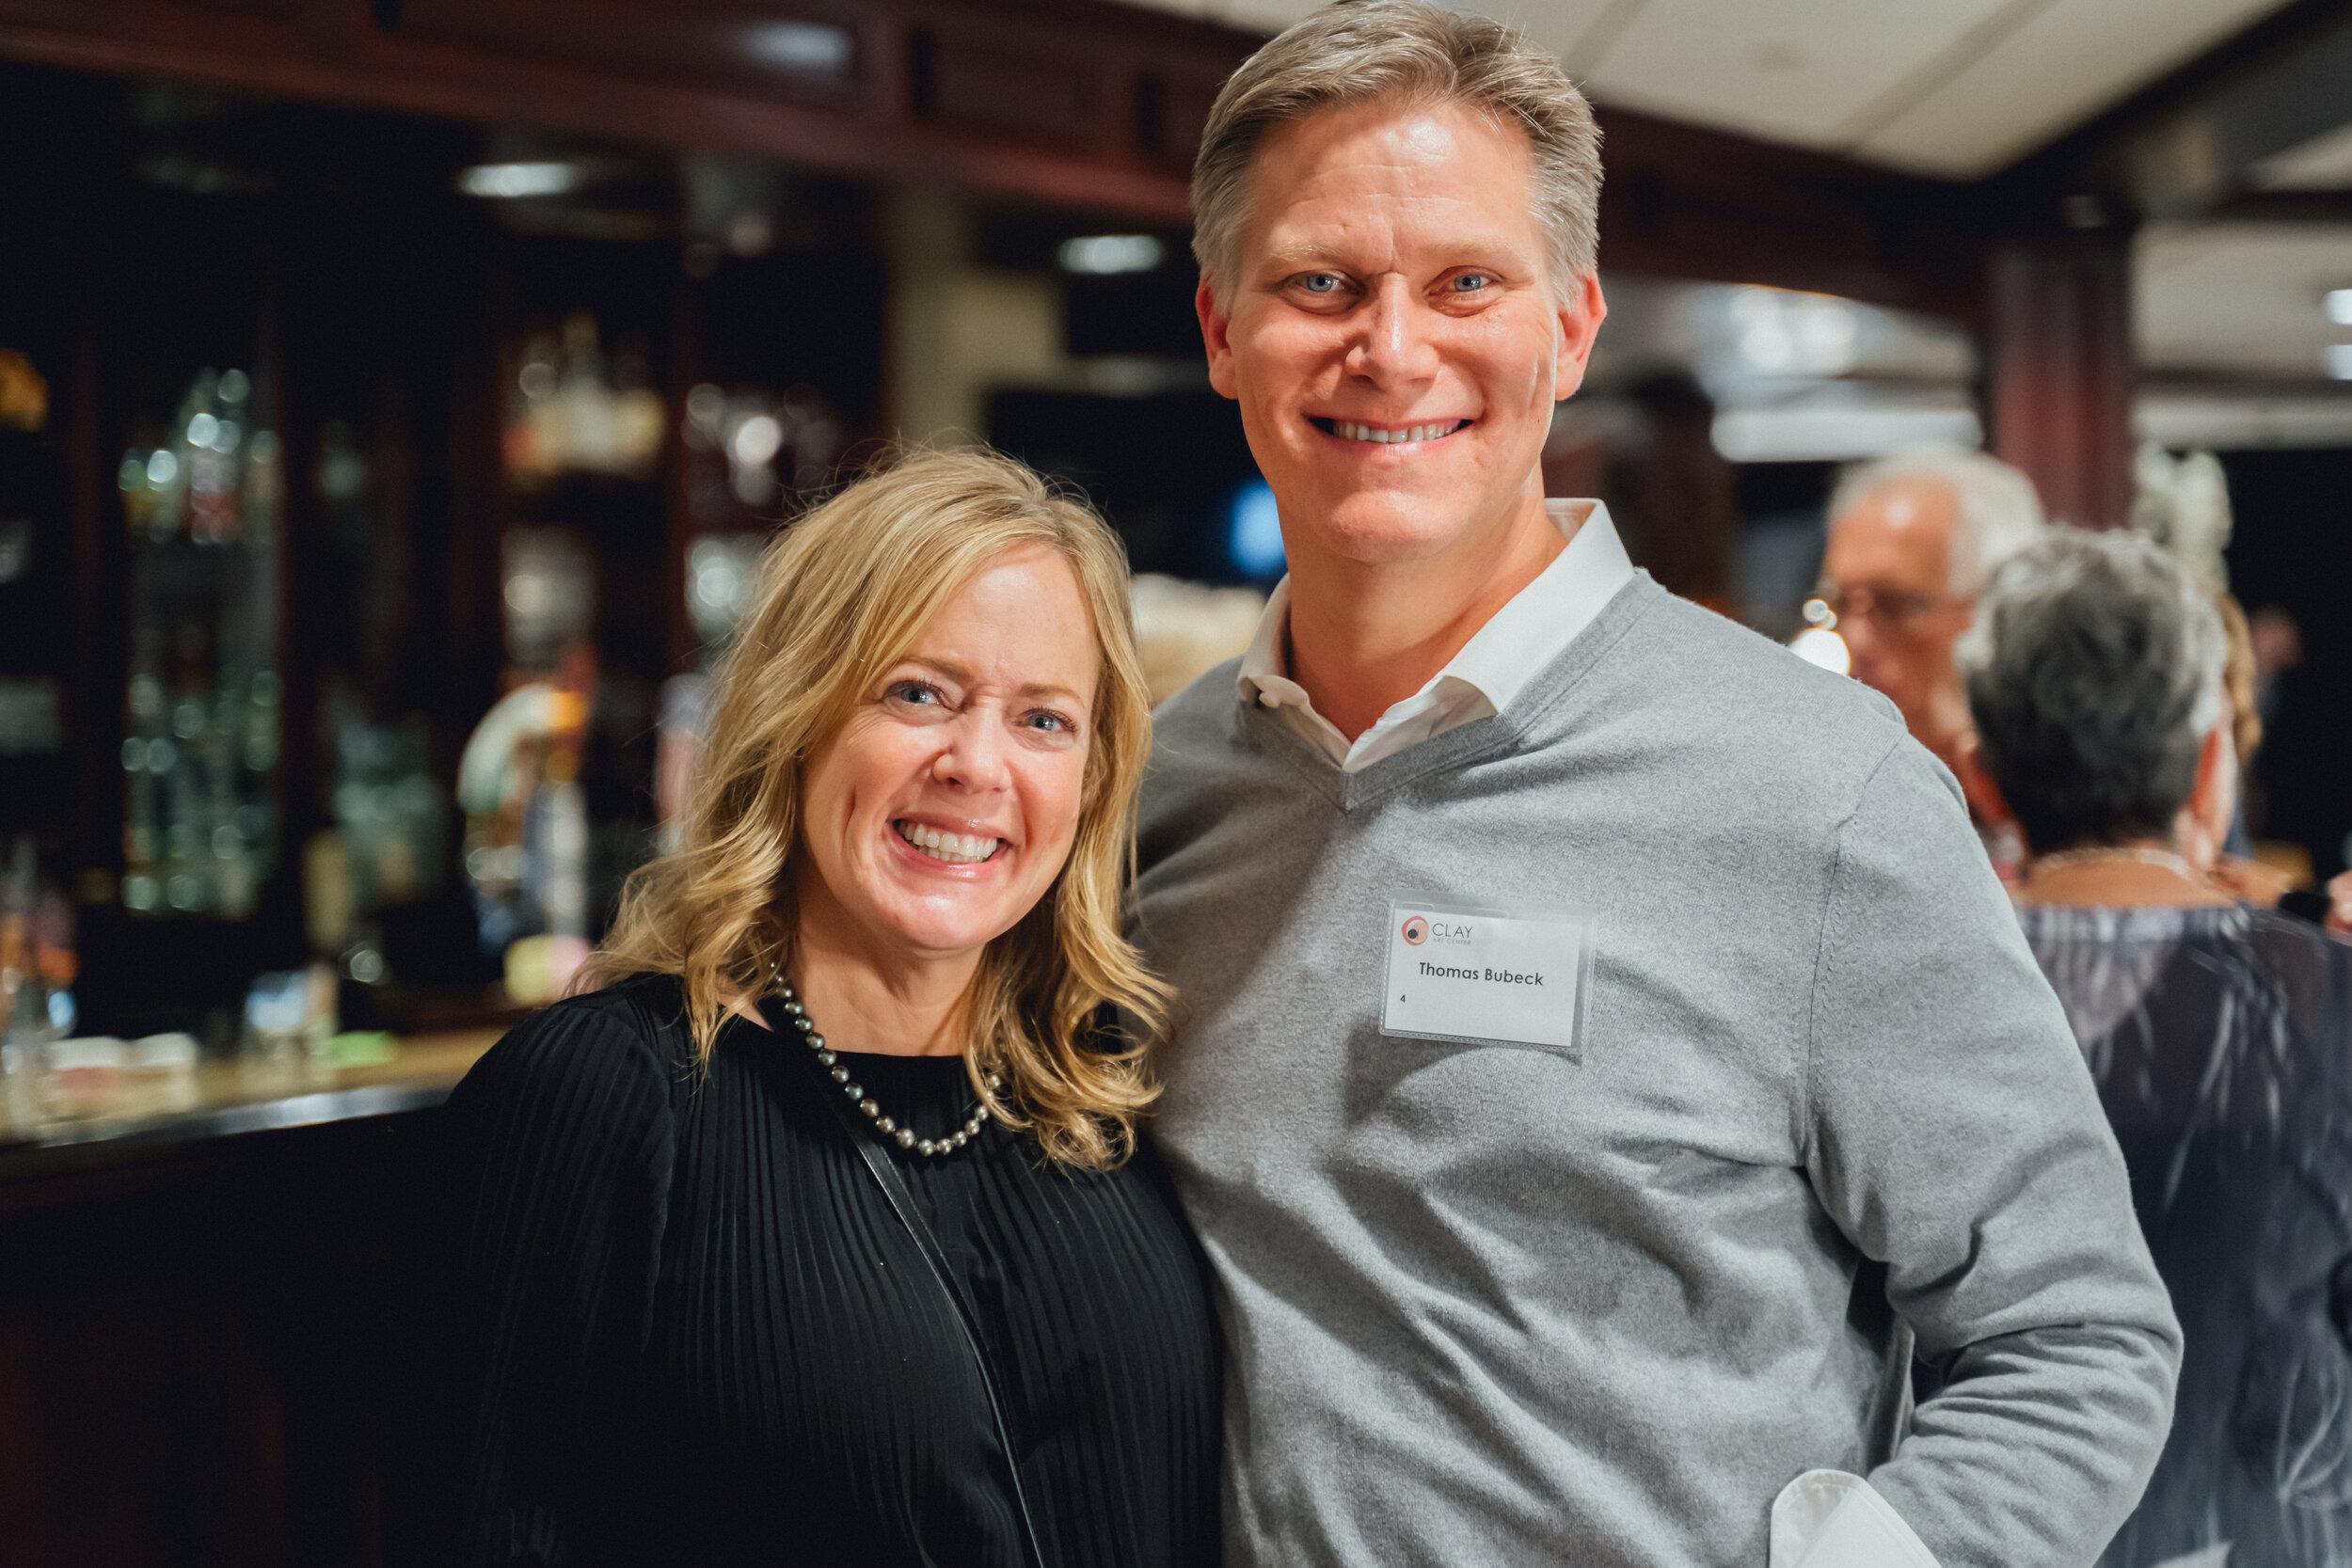 Clay Art Center Annual Benefit 2019 Mr. & Mrs. Thomas Bubeck.jpg